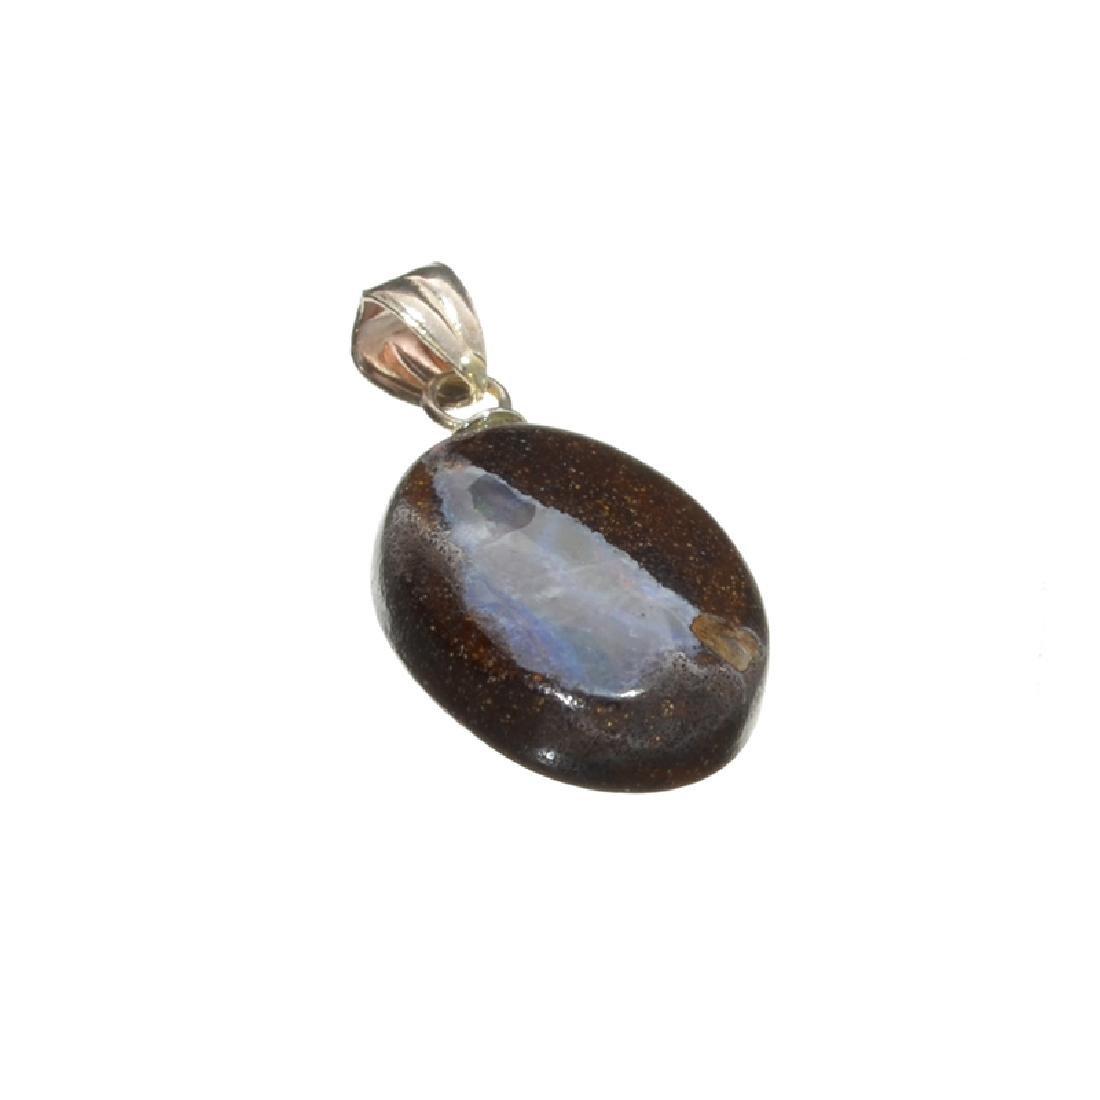 8.75CT Boulder Opal Sterling Silver Pendant